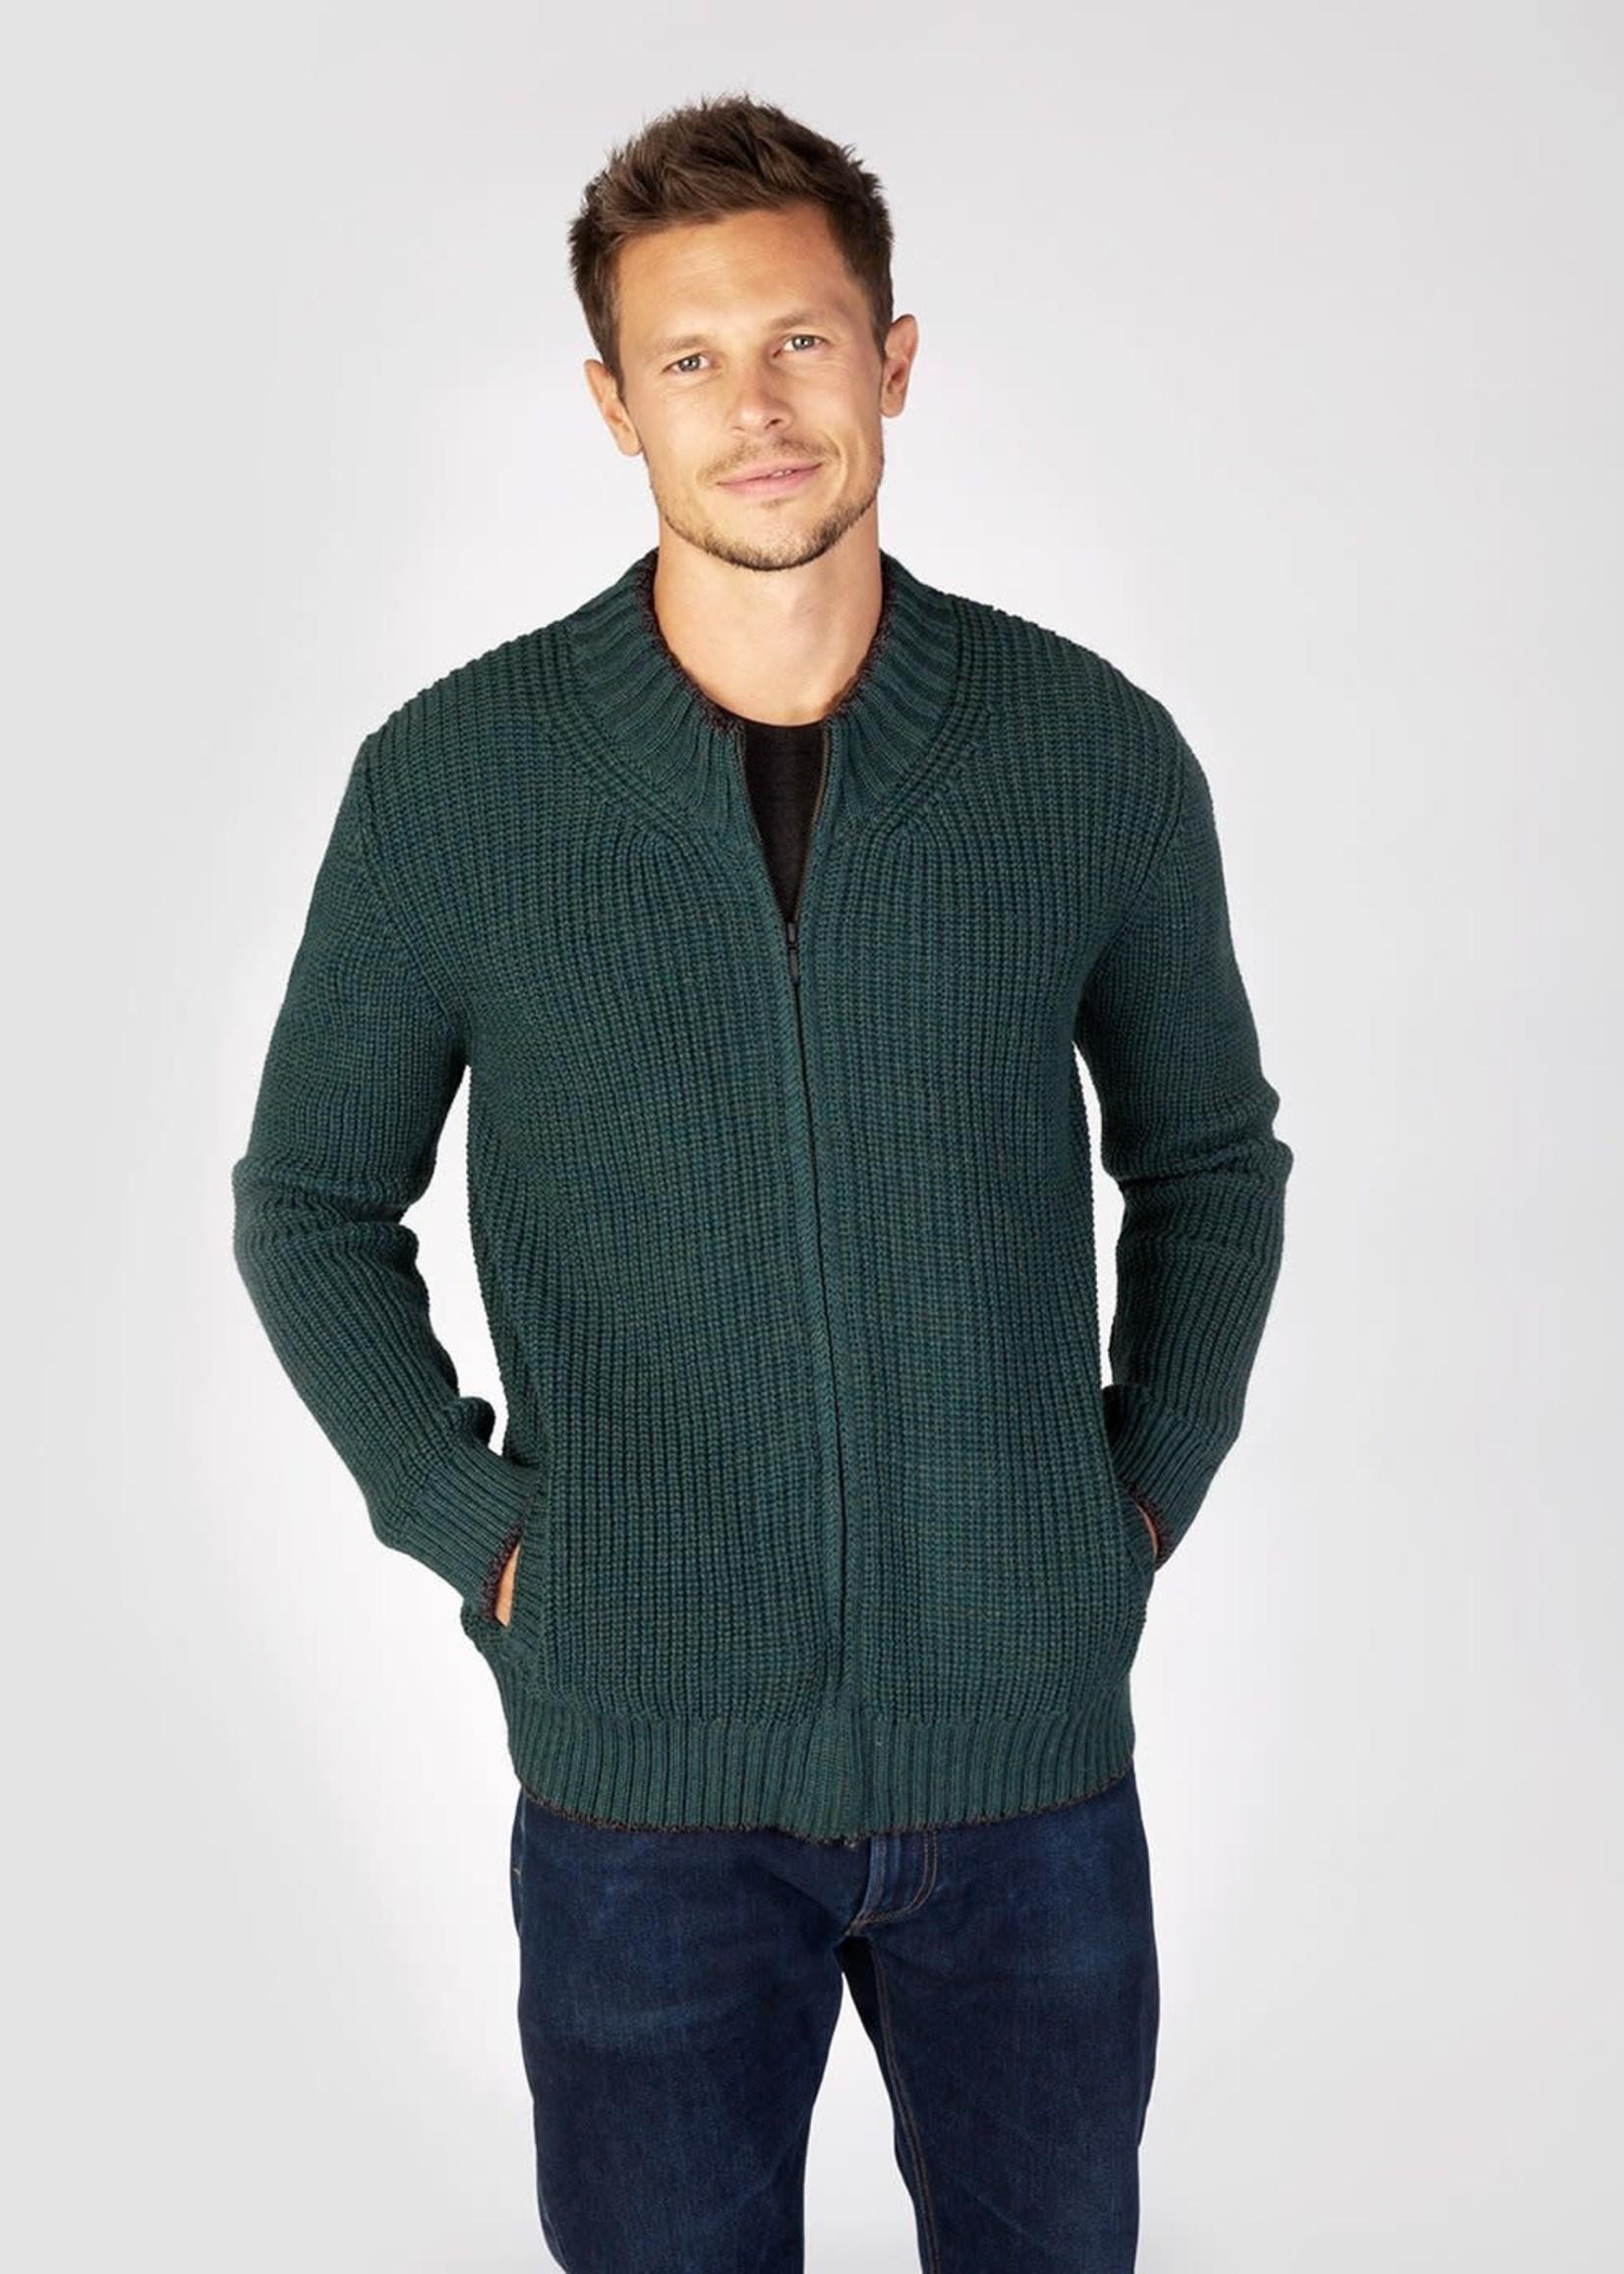 Ireland's Eye Ireland's Eye Rockbrook Evergreen Wool Ribbed Zipped Cardigan